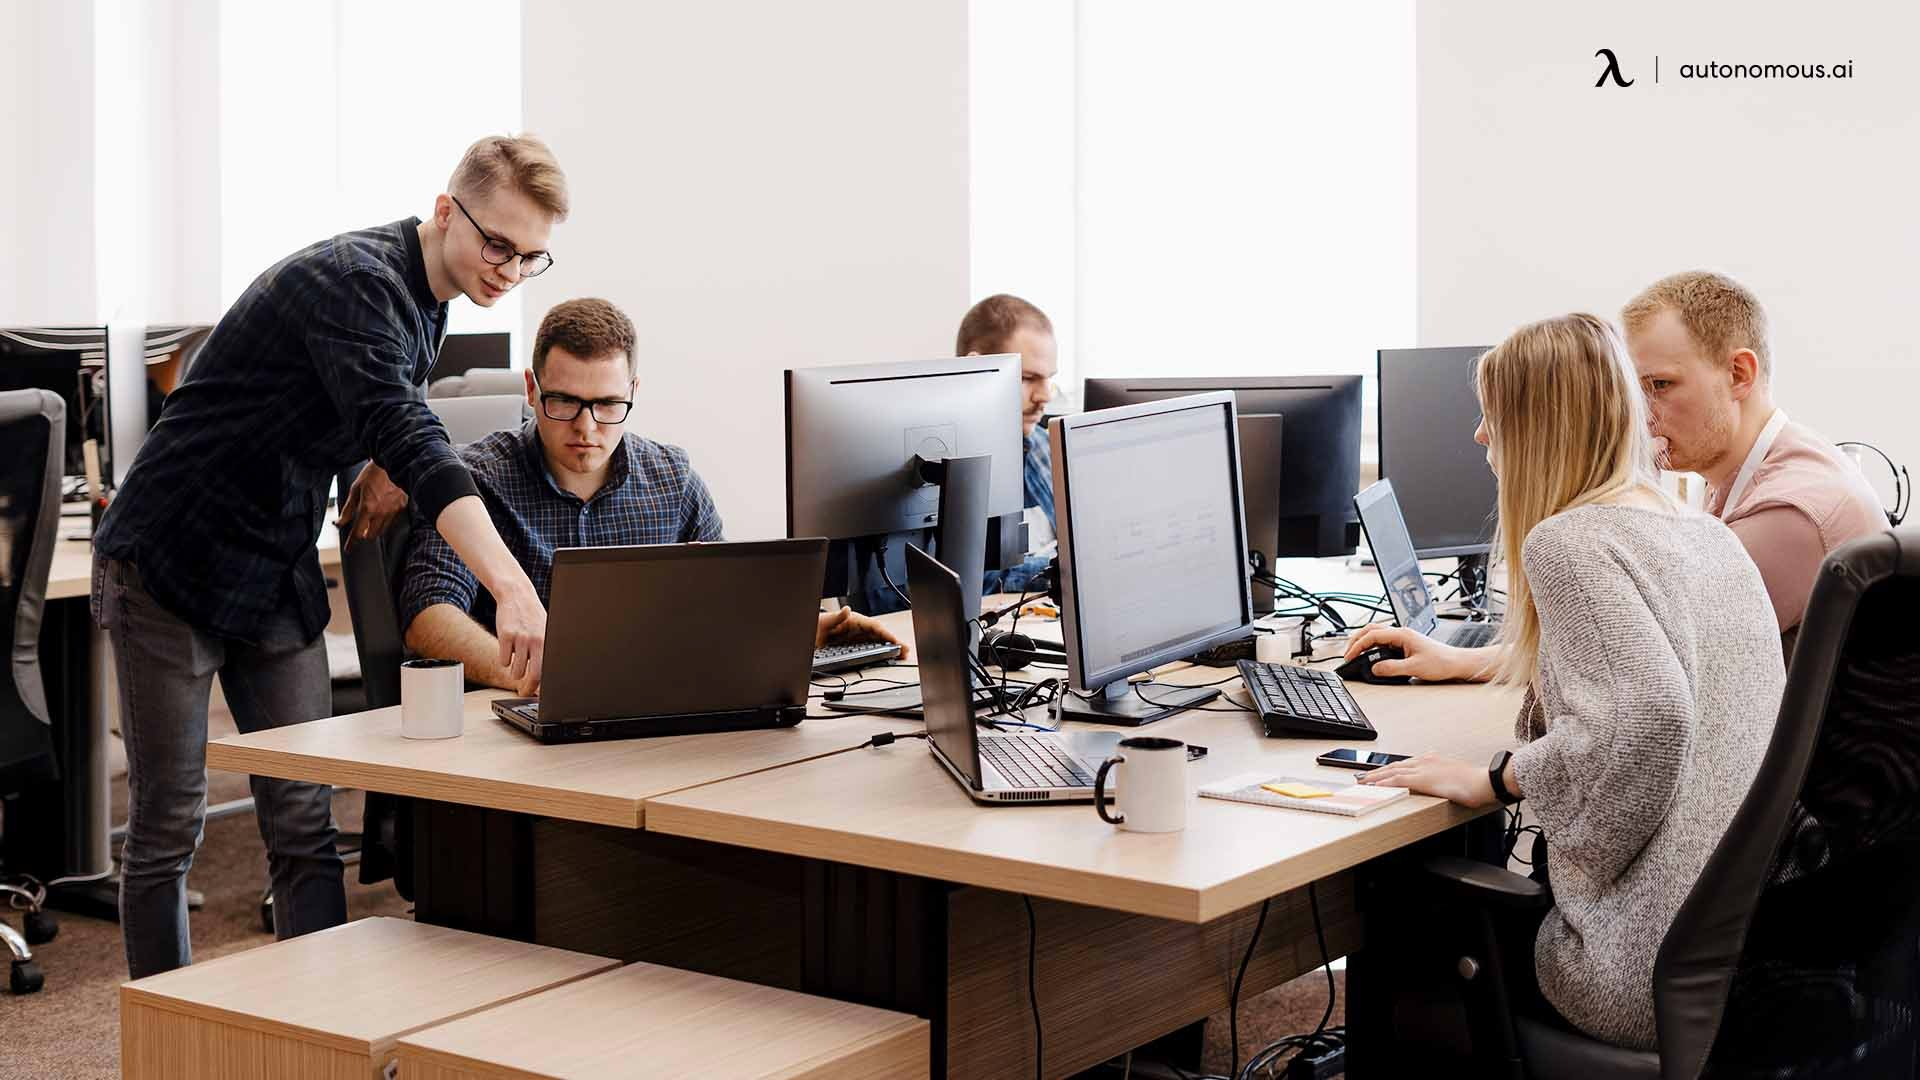 Disadvantages of Flexible Work Arrangements